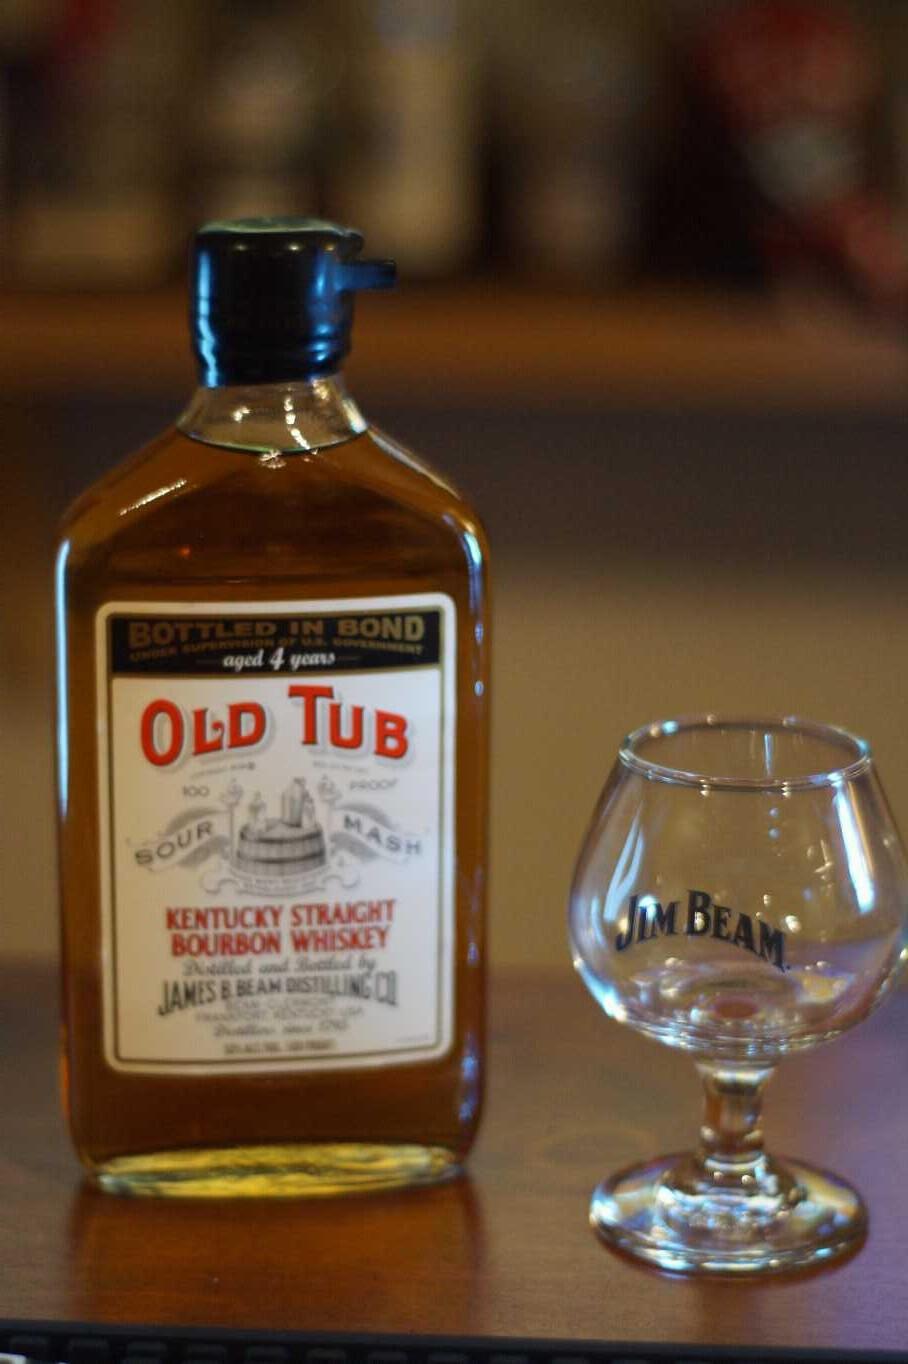 Old Tub Bottled-in-Bond Bourbon Review - ModernThirst